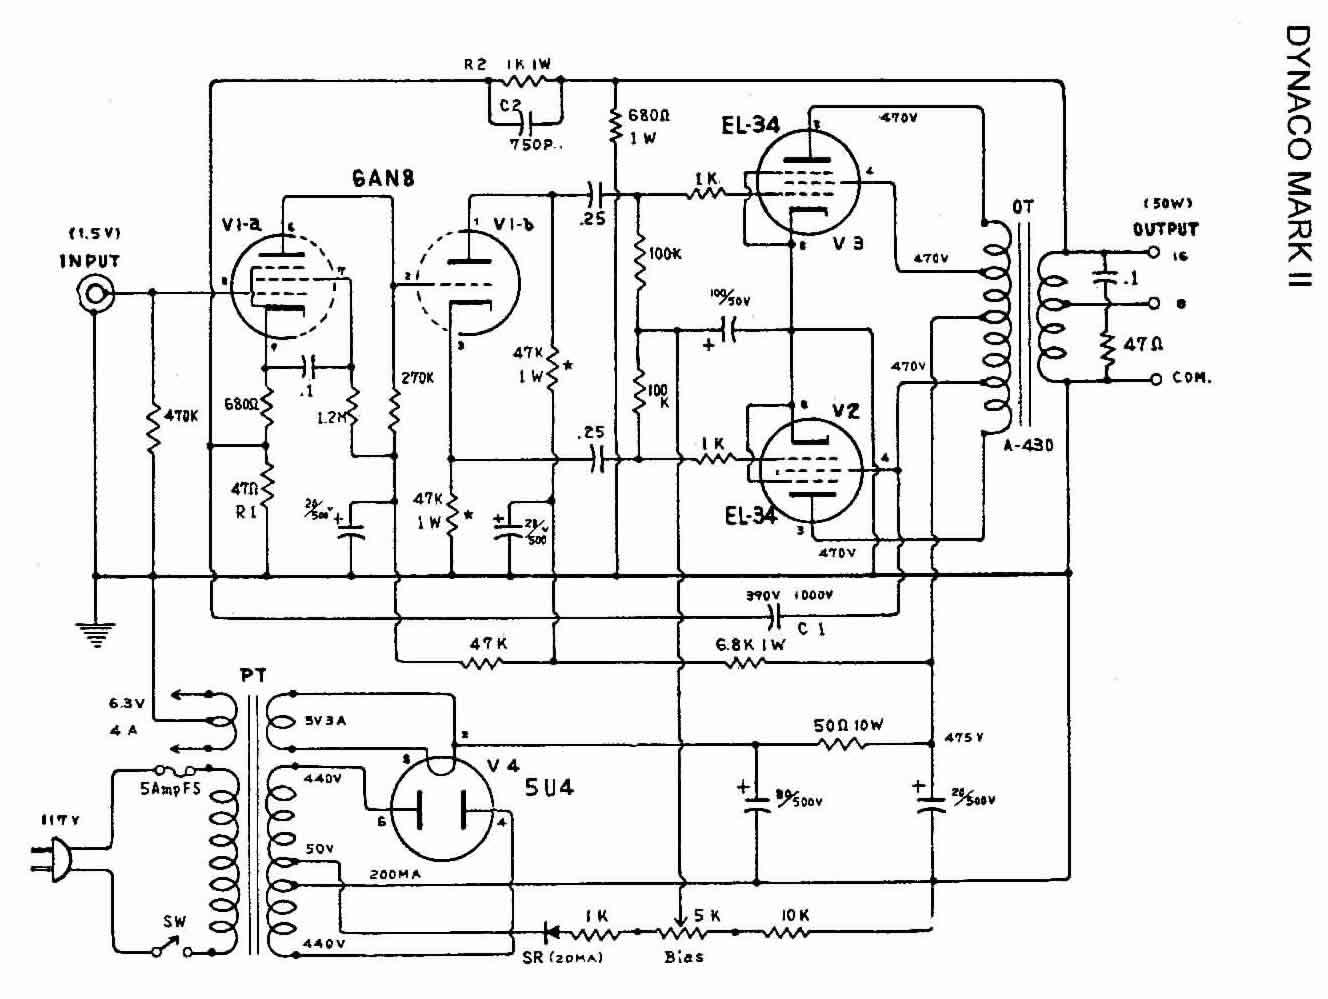 Stc 1000 Wiring Diagram Free Download Wiring Diagram Schematic